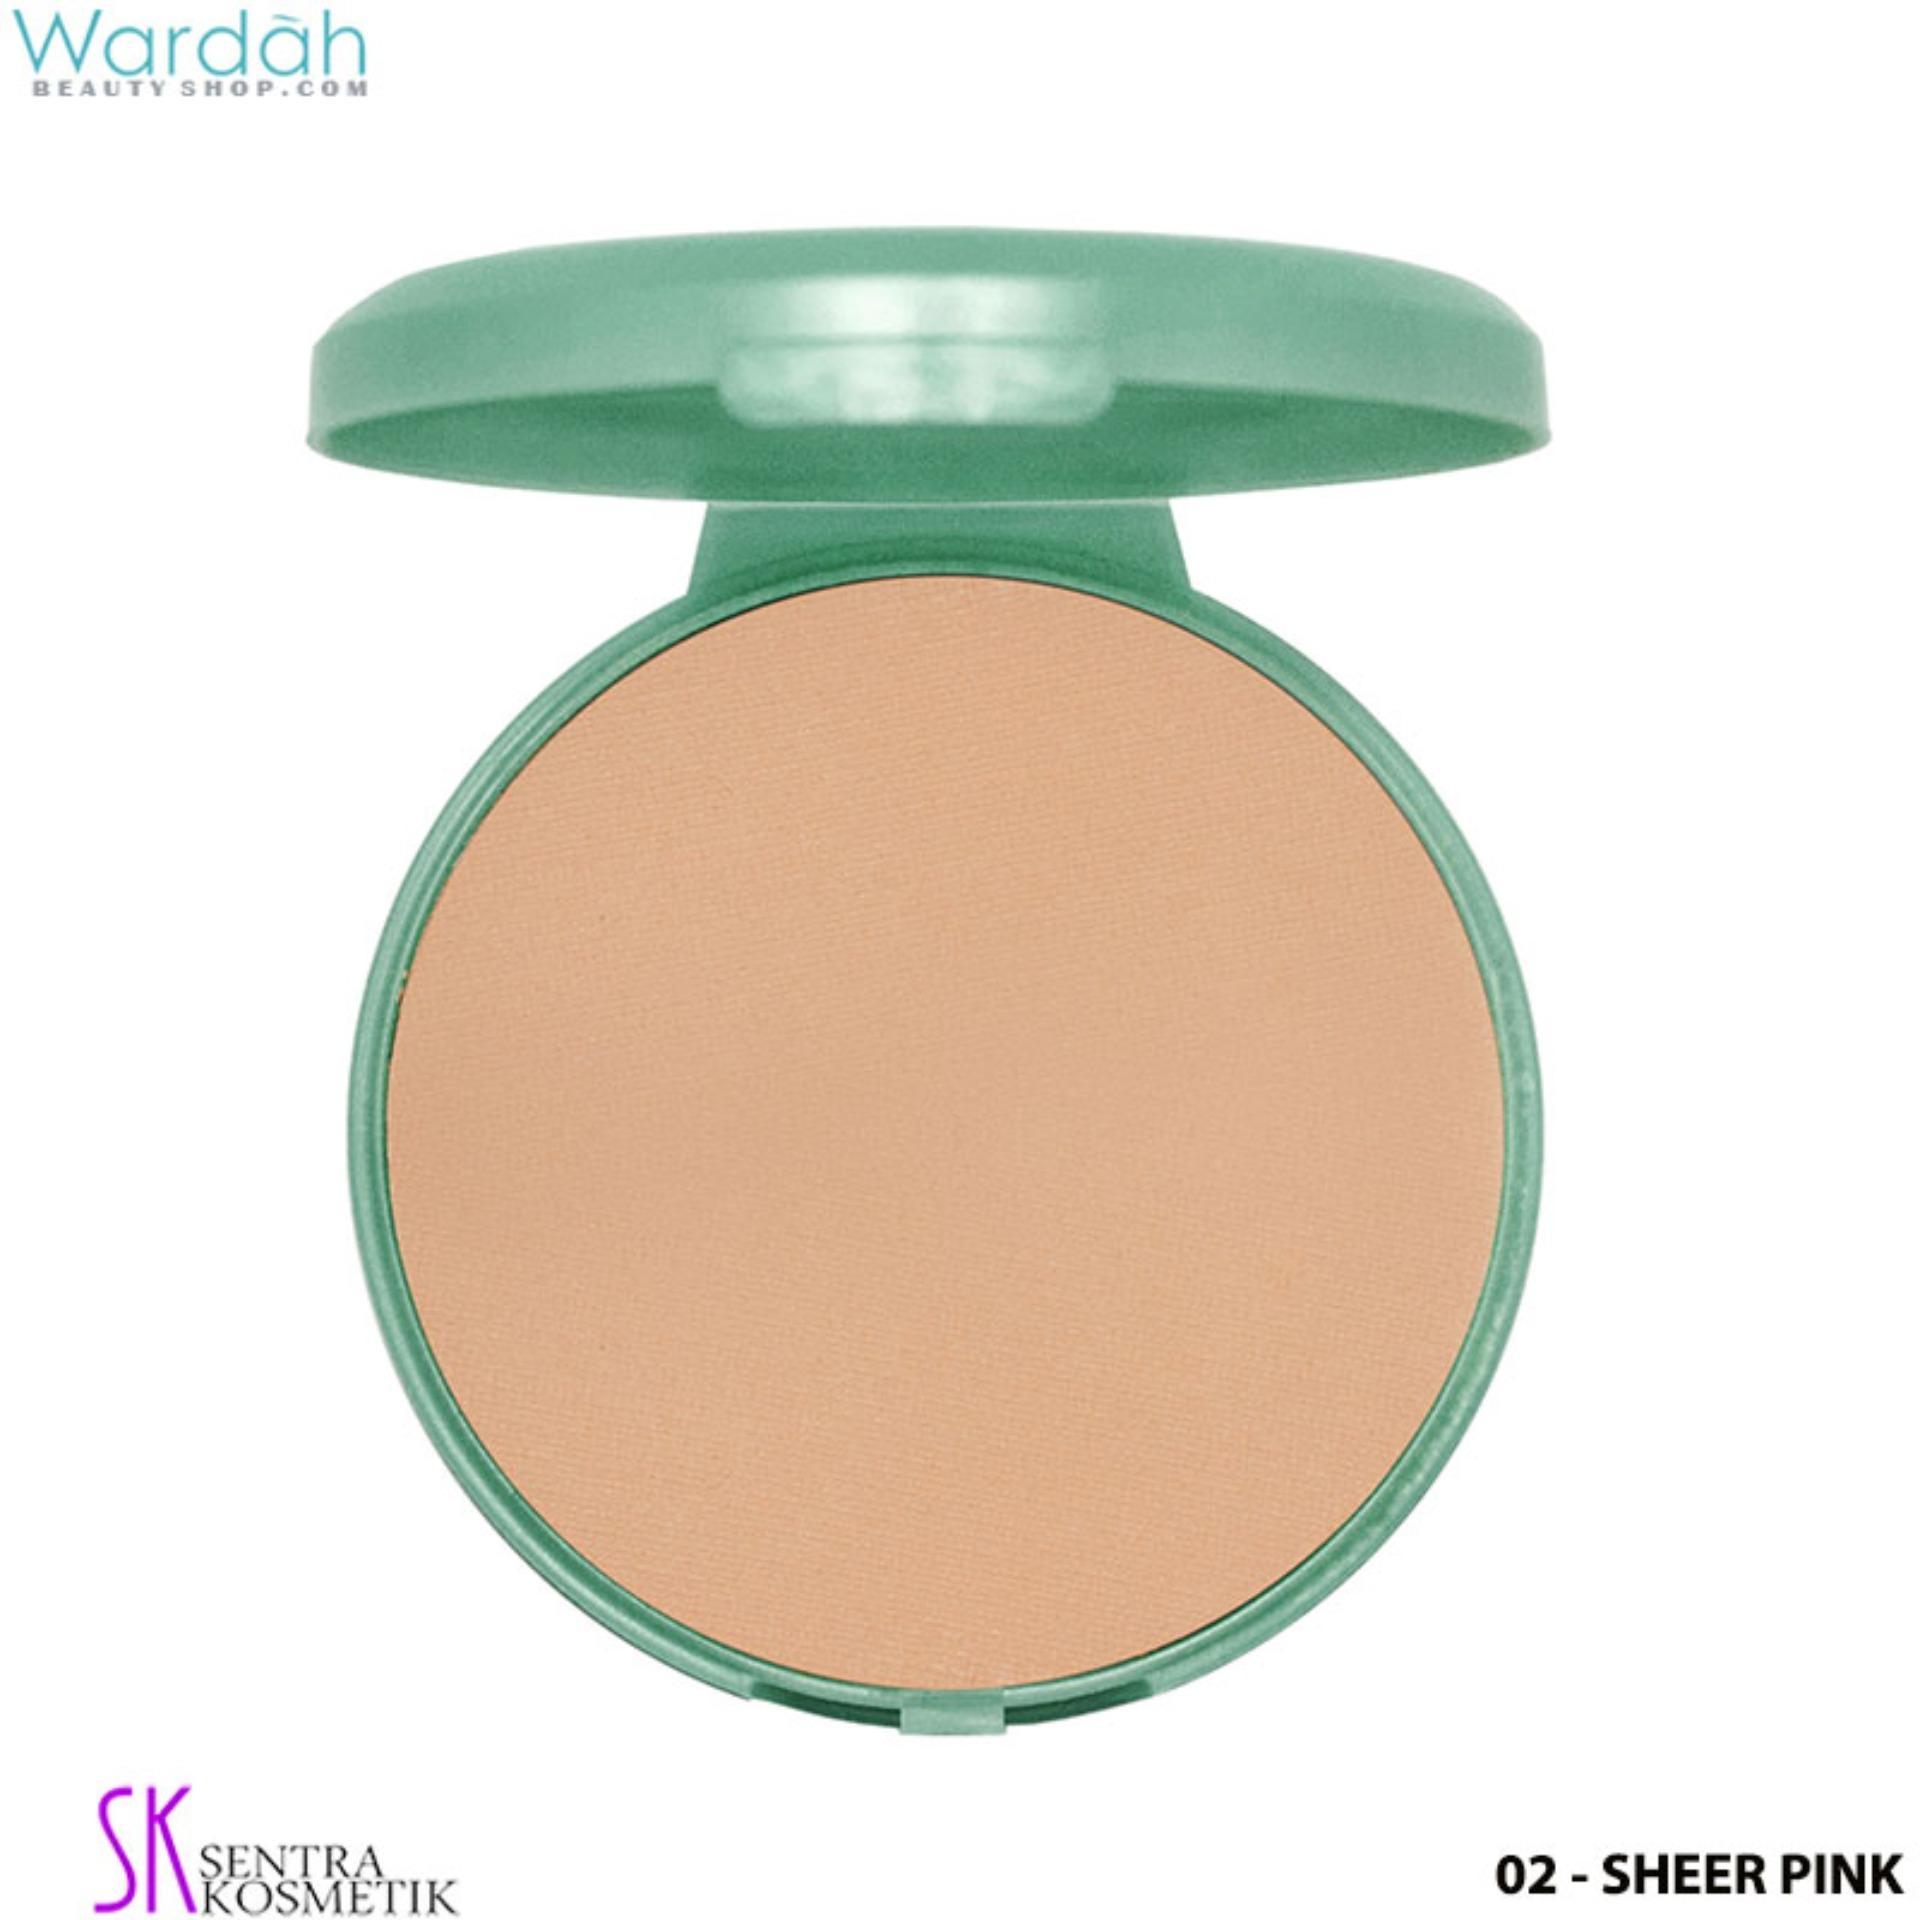 Wardah EXCLUSIVE REFILL Two Way Cake 02 - Sheer Pink